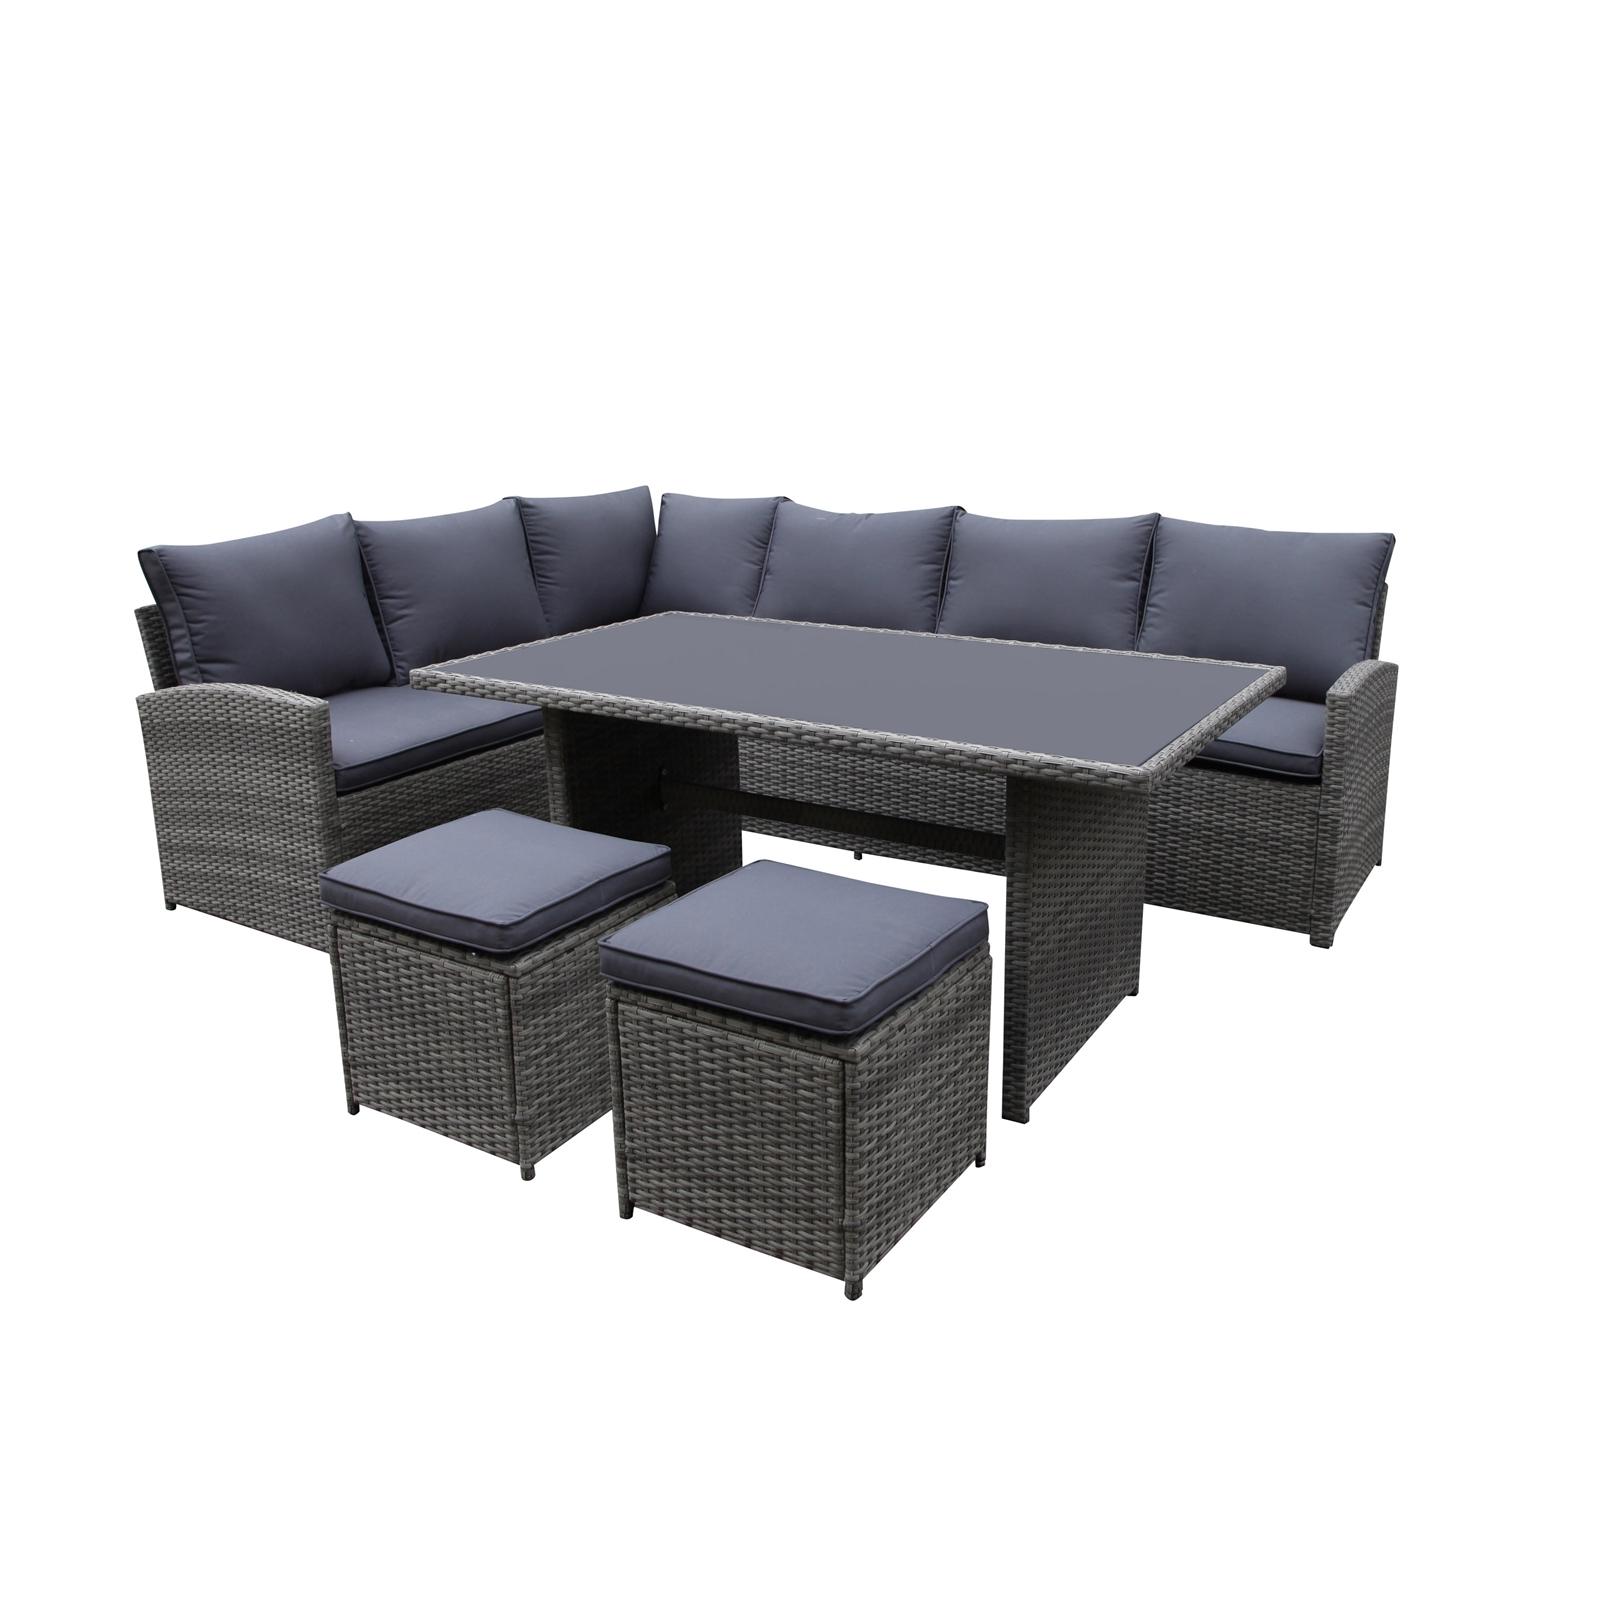 Matara Corner Sofa Dining and Garden Furniture Set £499 @ Homebase